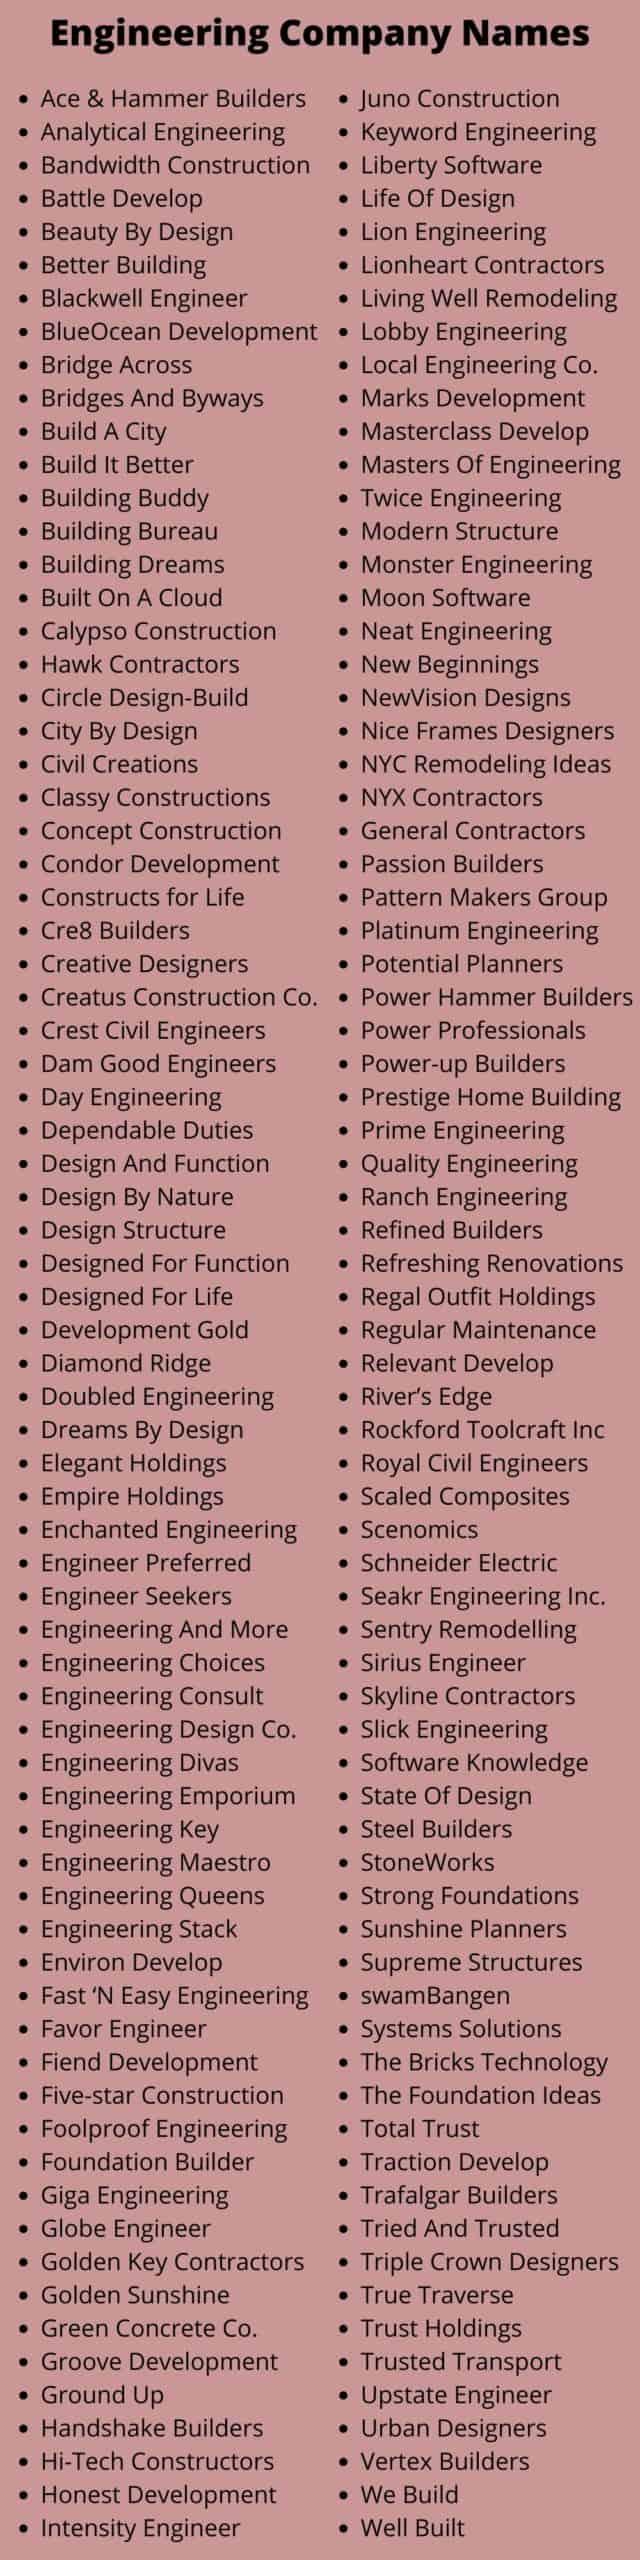 Engineering Company Names